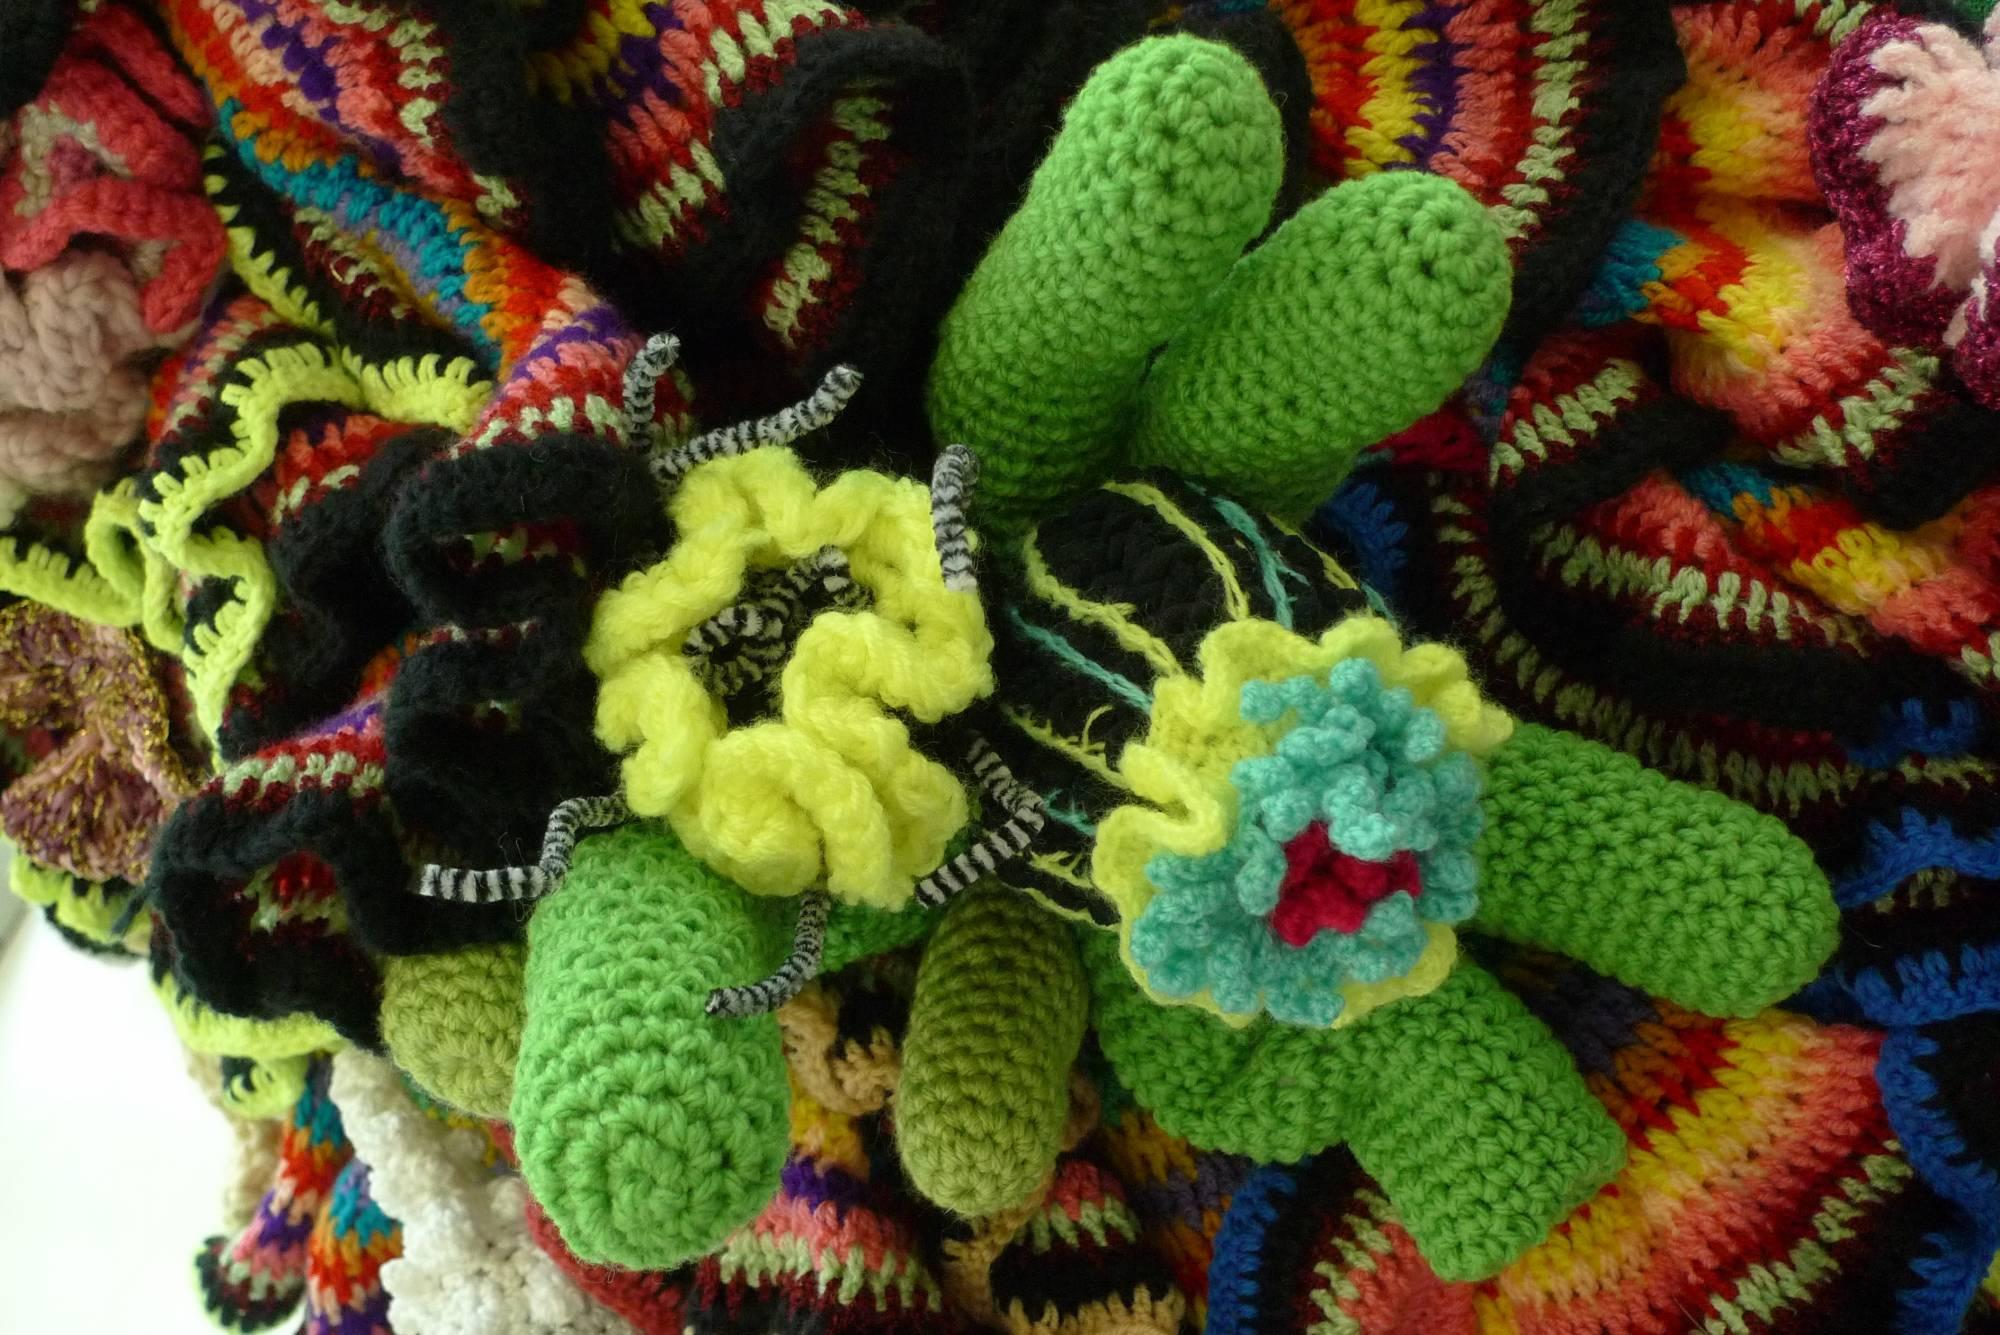 crochet coral sculpture